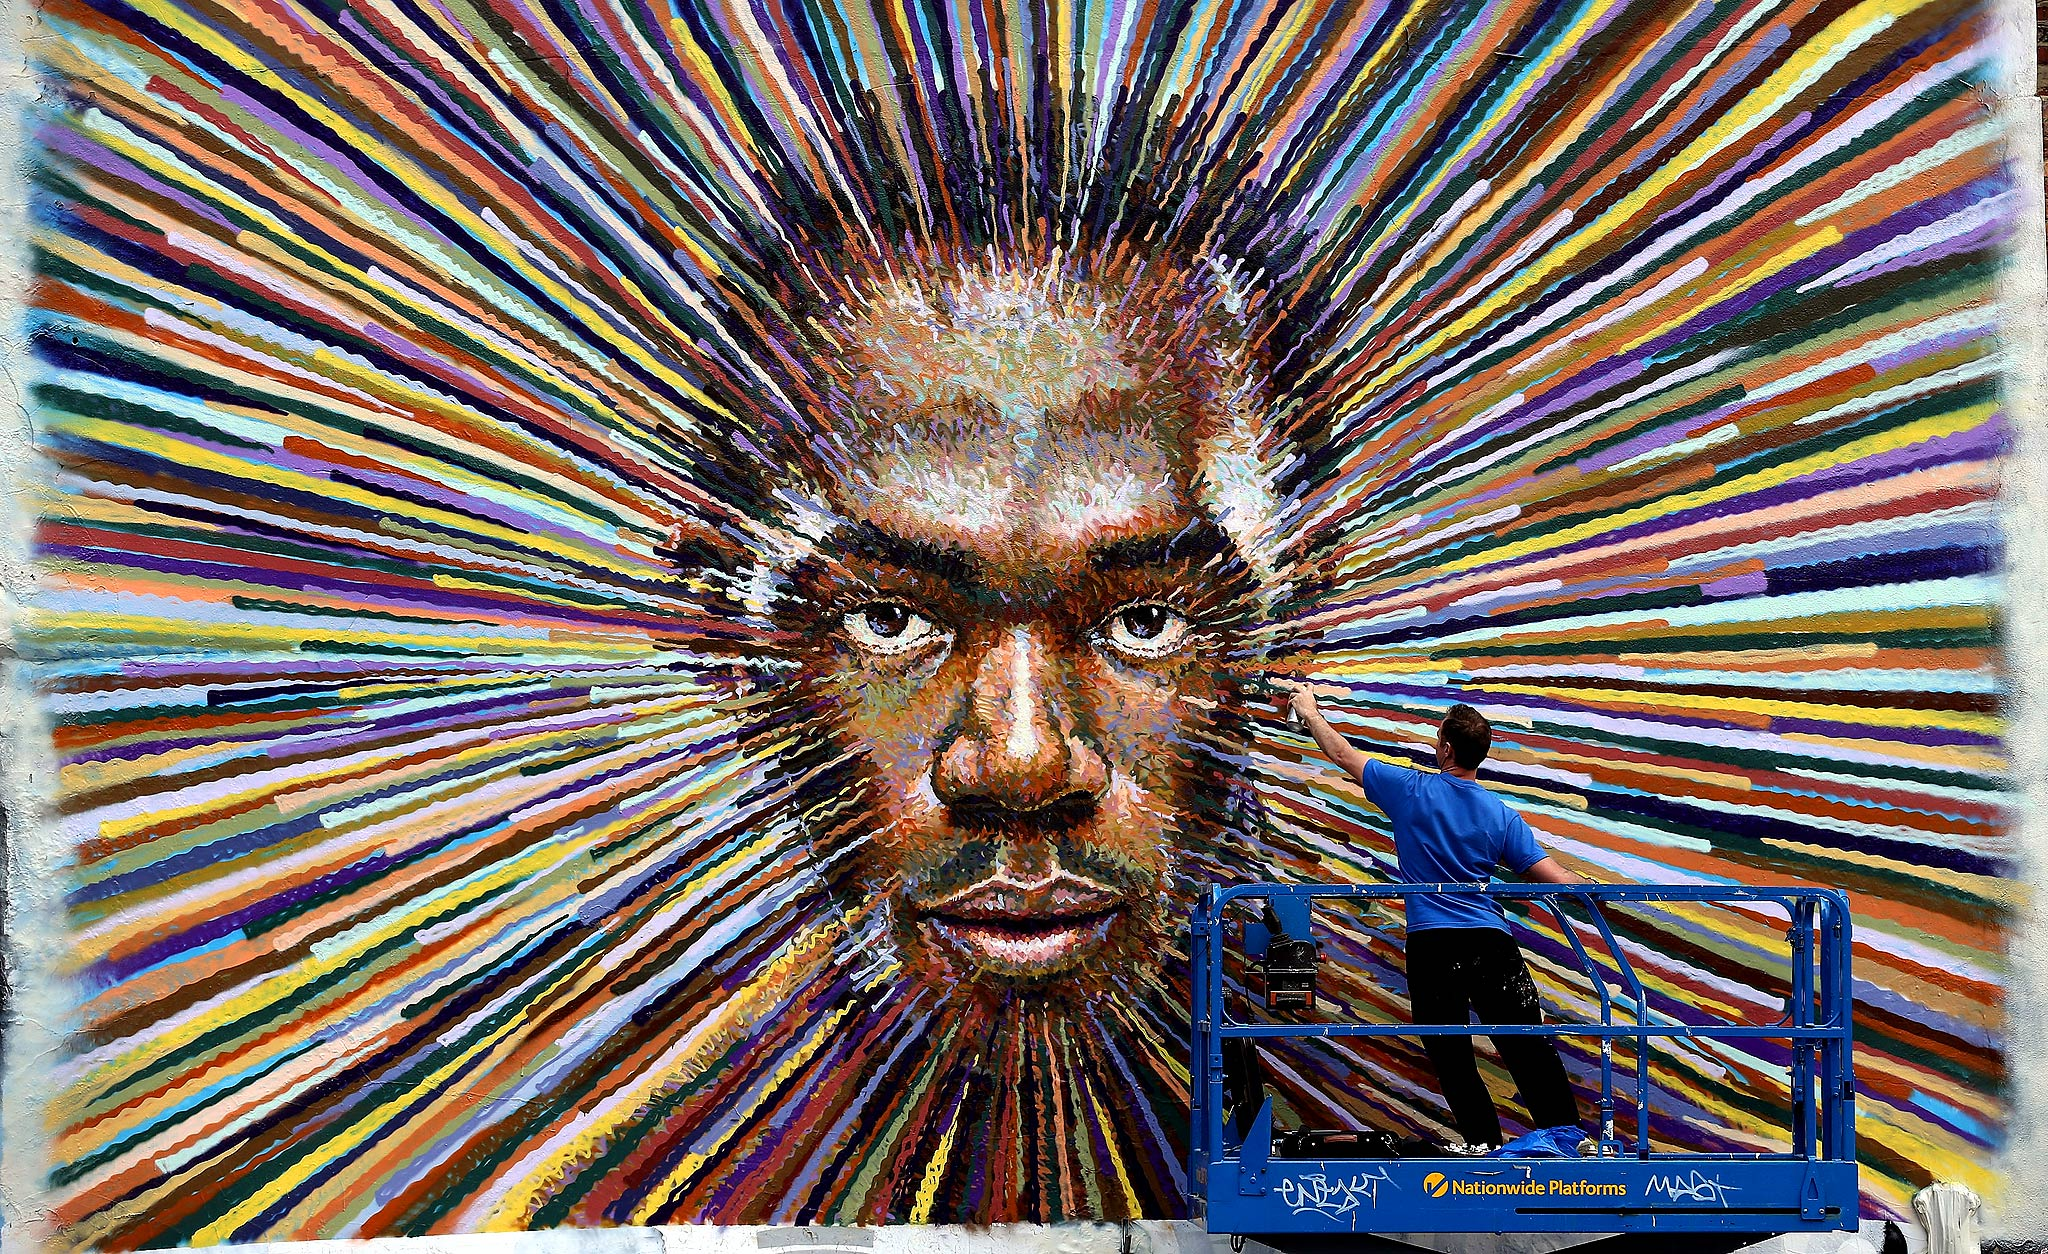 Usain Bolt mural